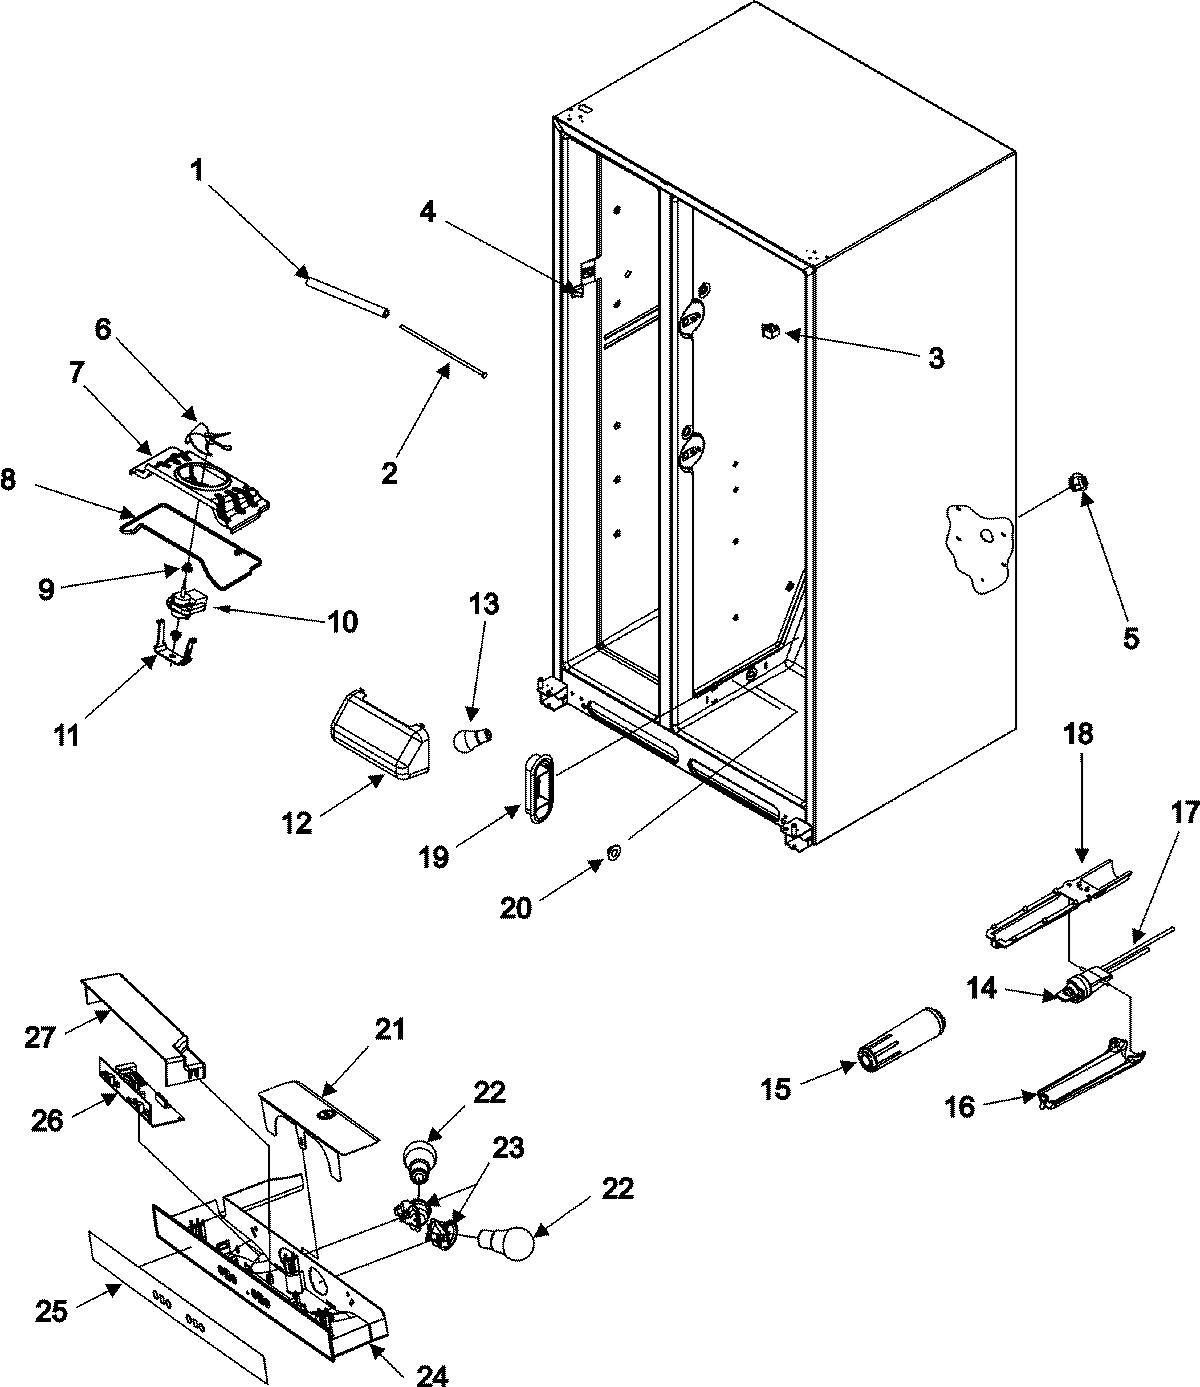 wiring diagram ge washer gtwn2800dww wiring database wiring ge washer motor wiring diagram 2000 ford taurus engine diagram